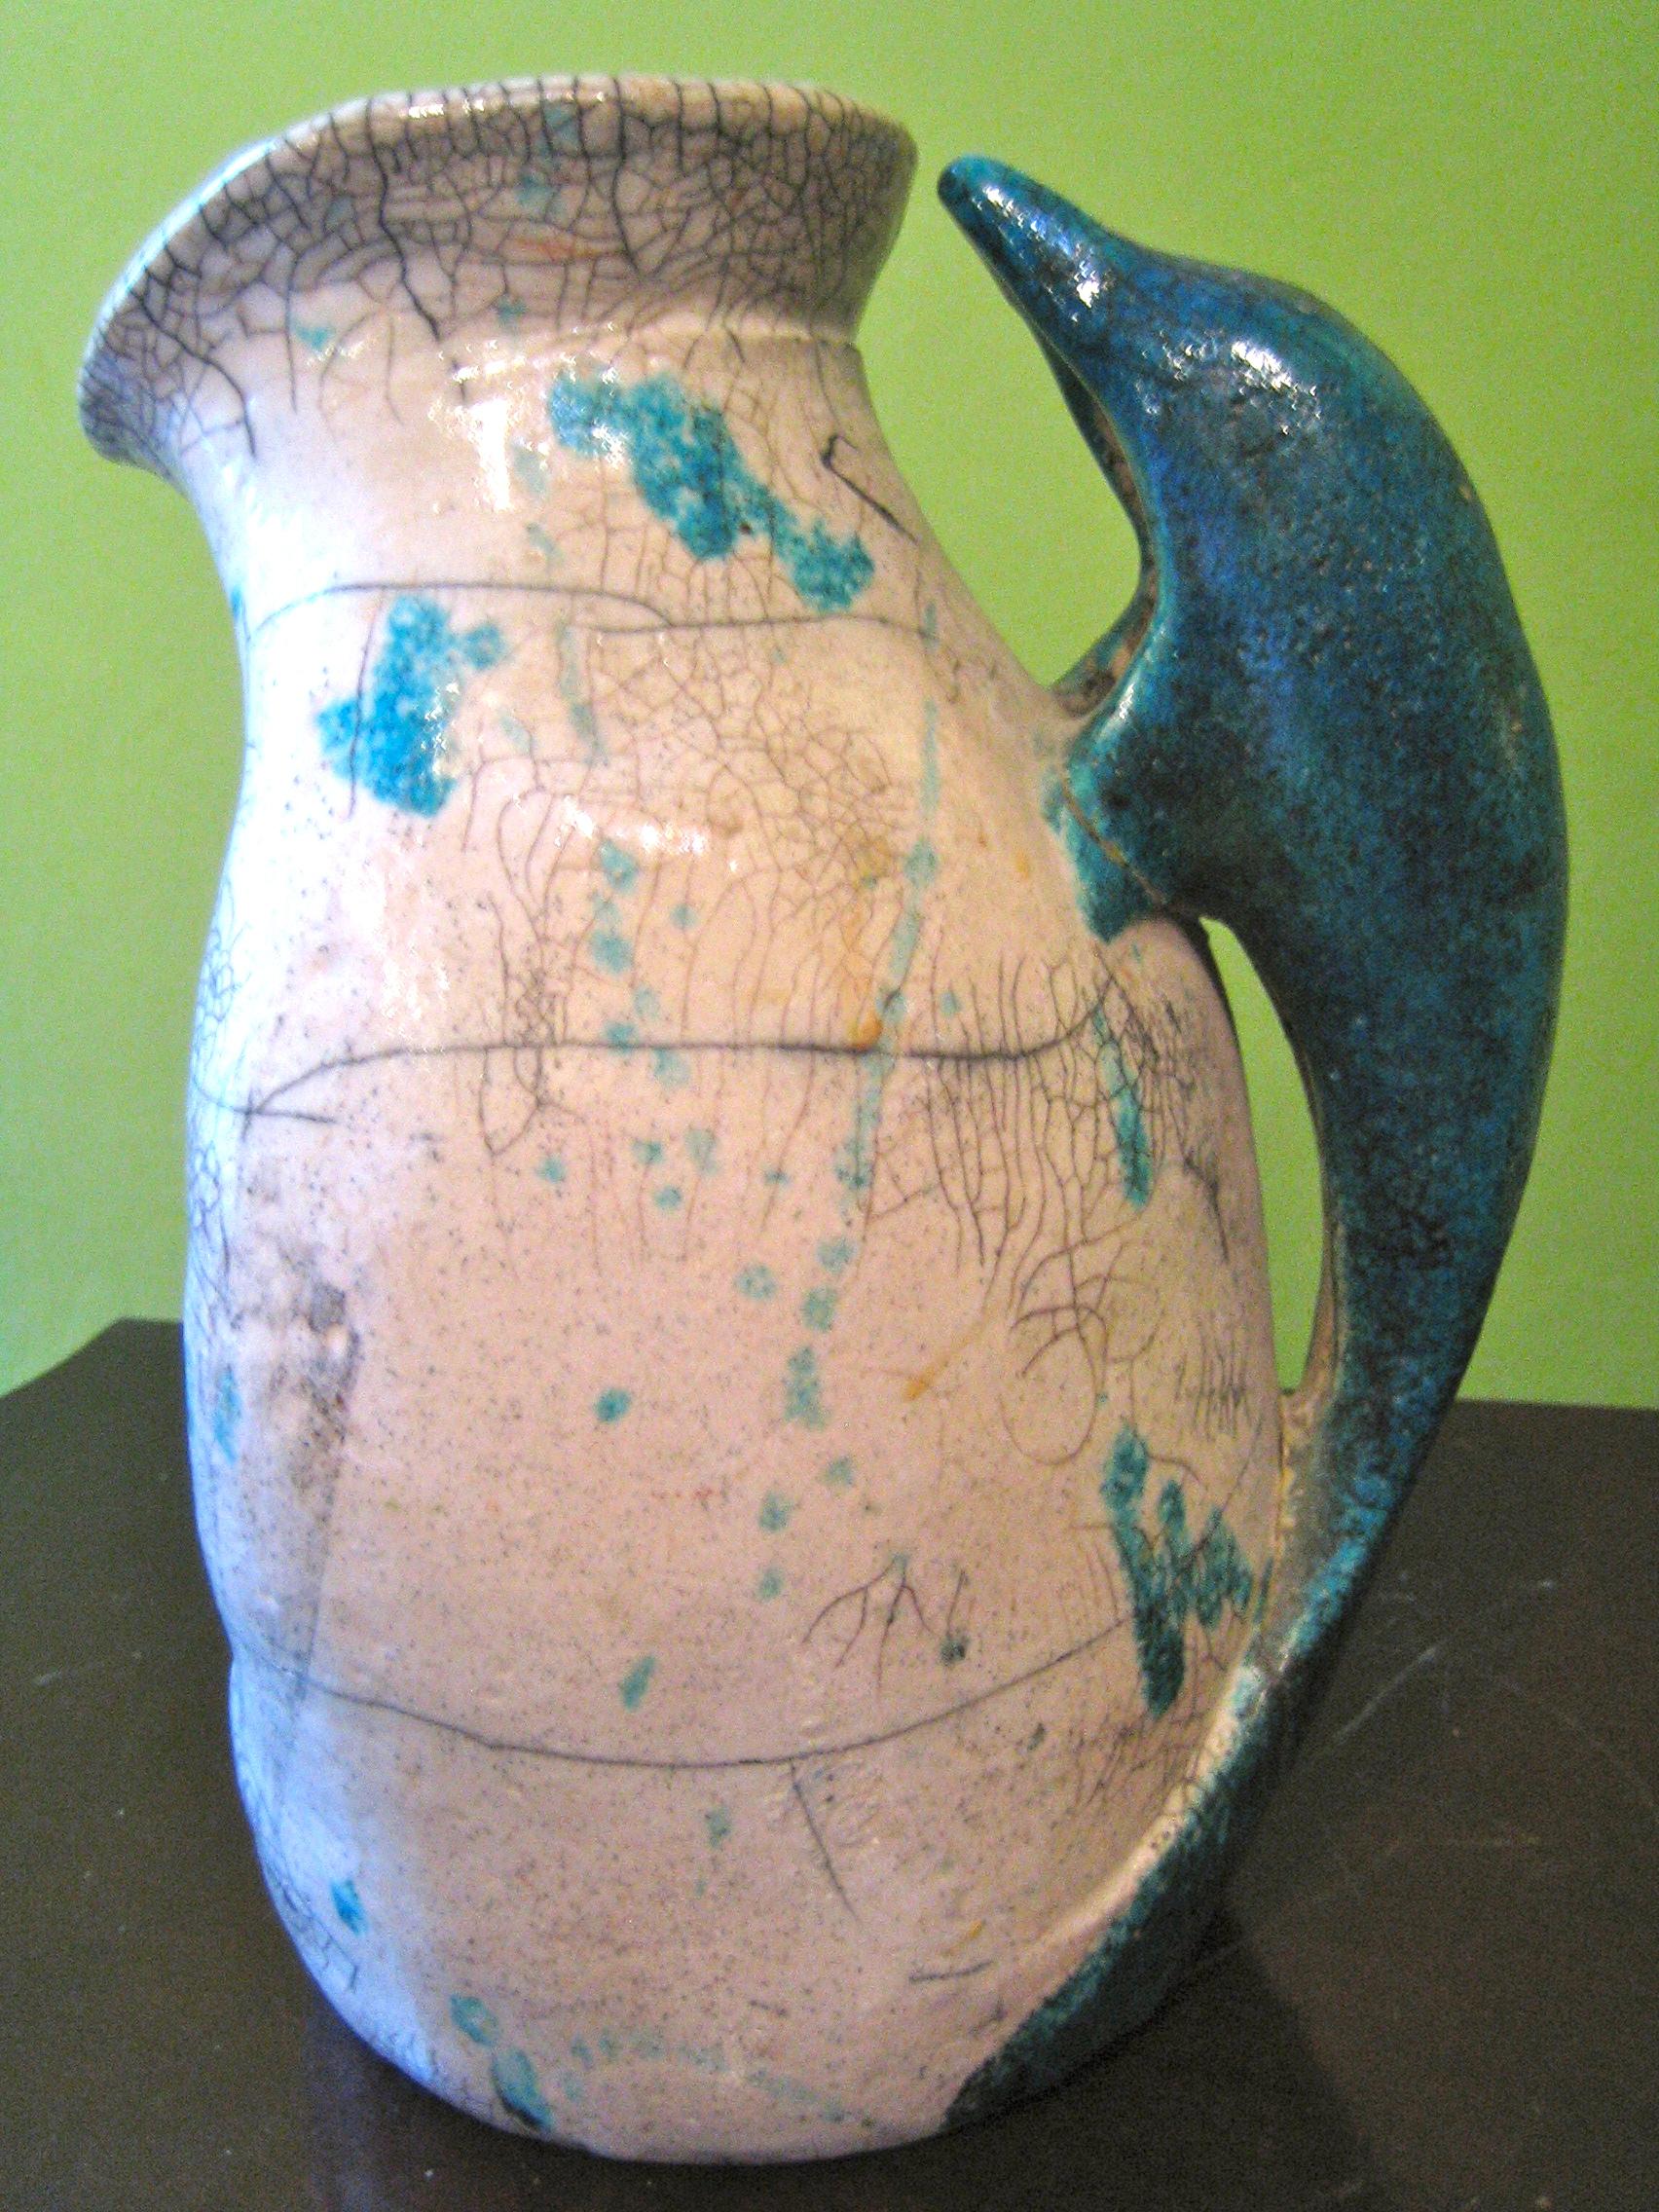 Porposeful Jug -  1991 hand coiled ceramic (sold)